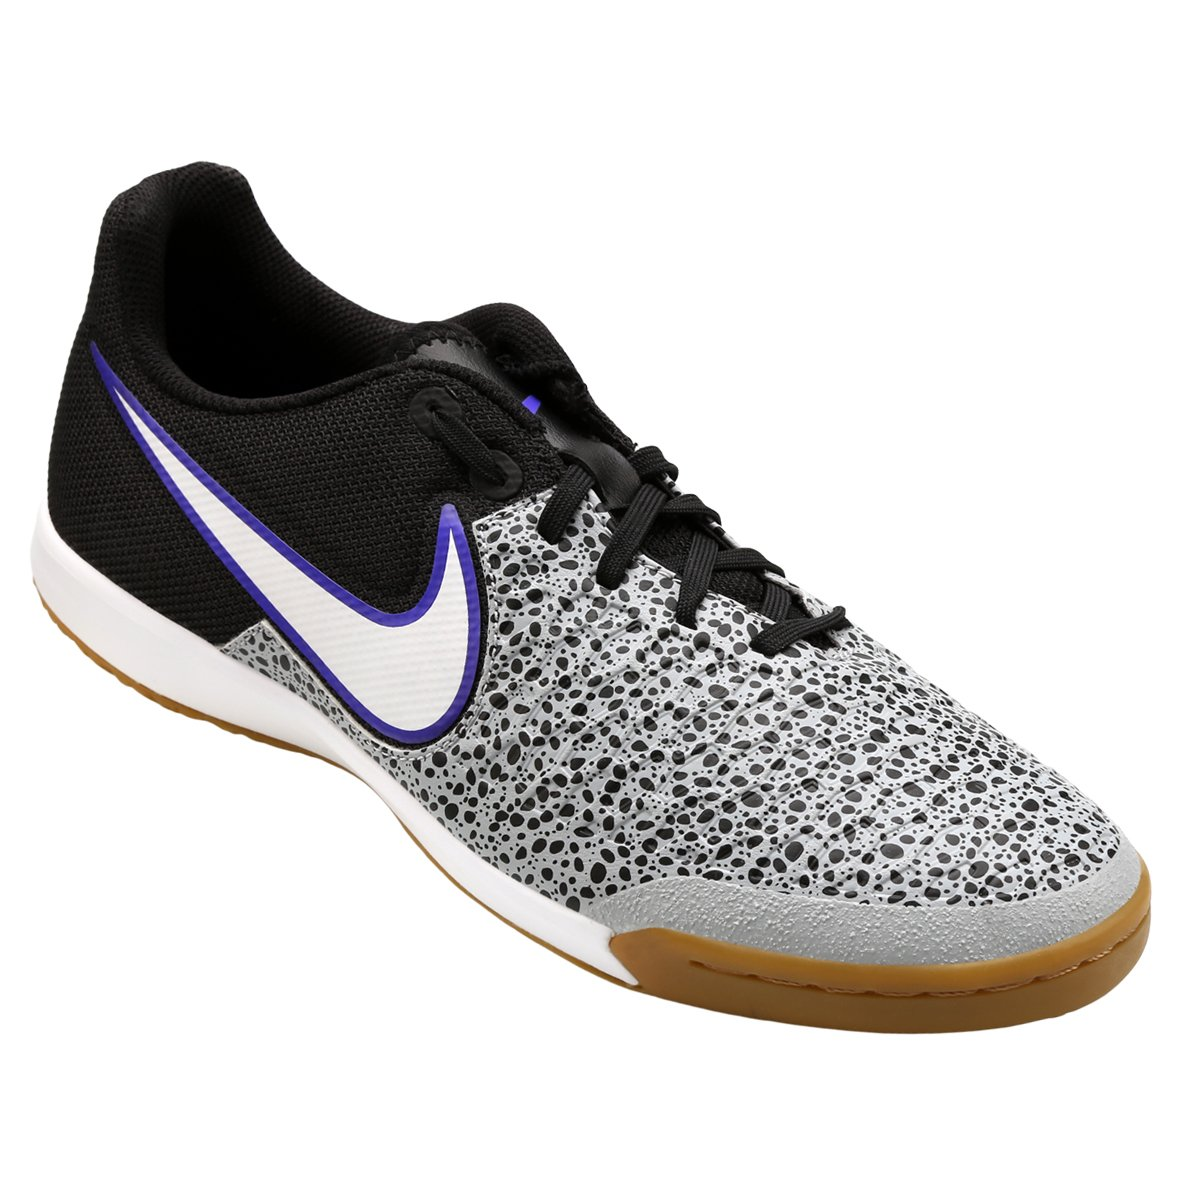 Chuteira Nike Magista X Pro IC Futsal - Compre Agora  daa70d4f30995